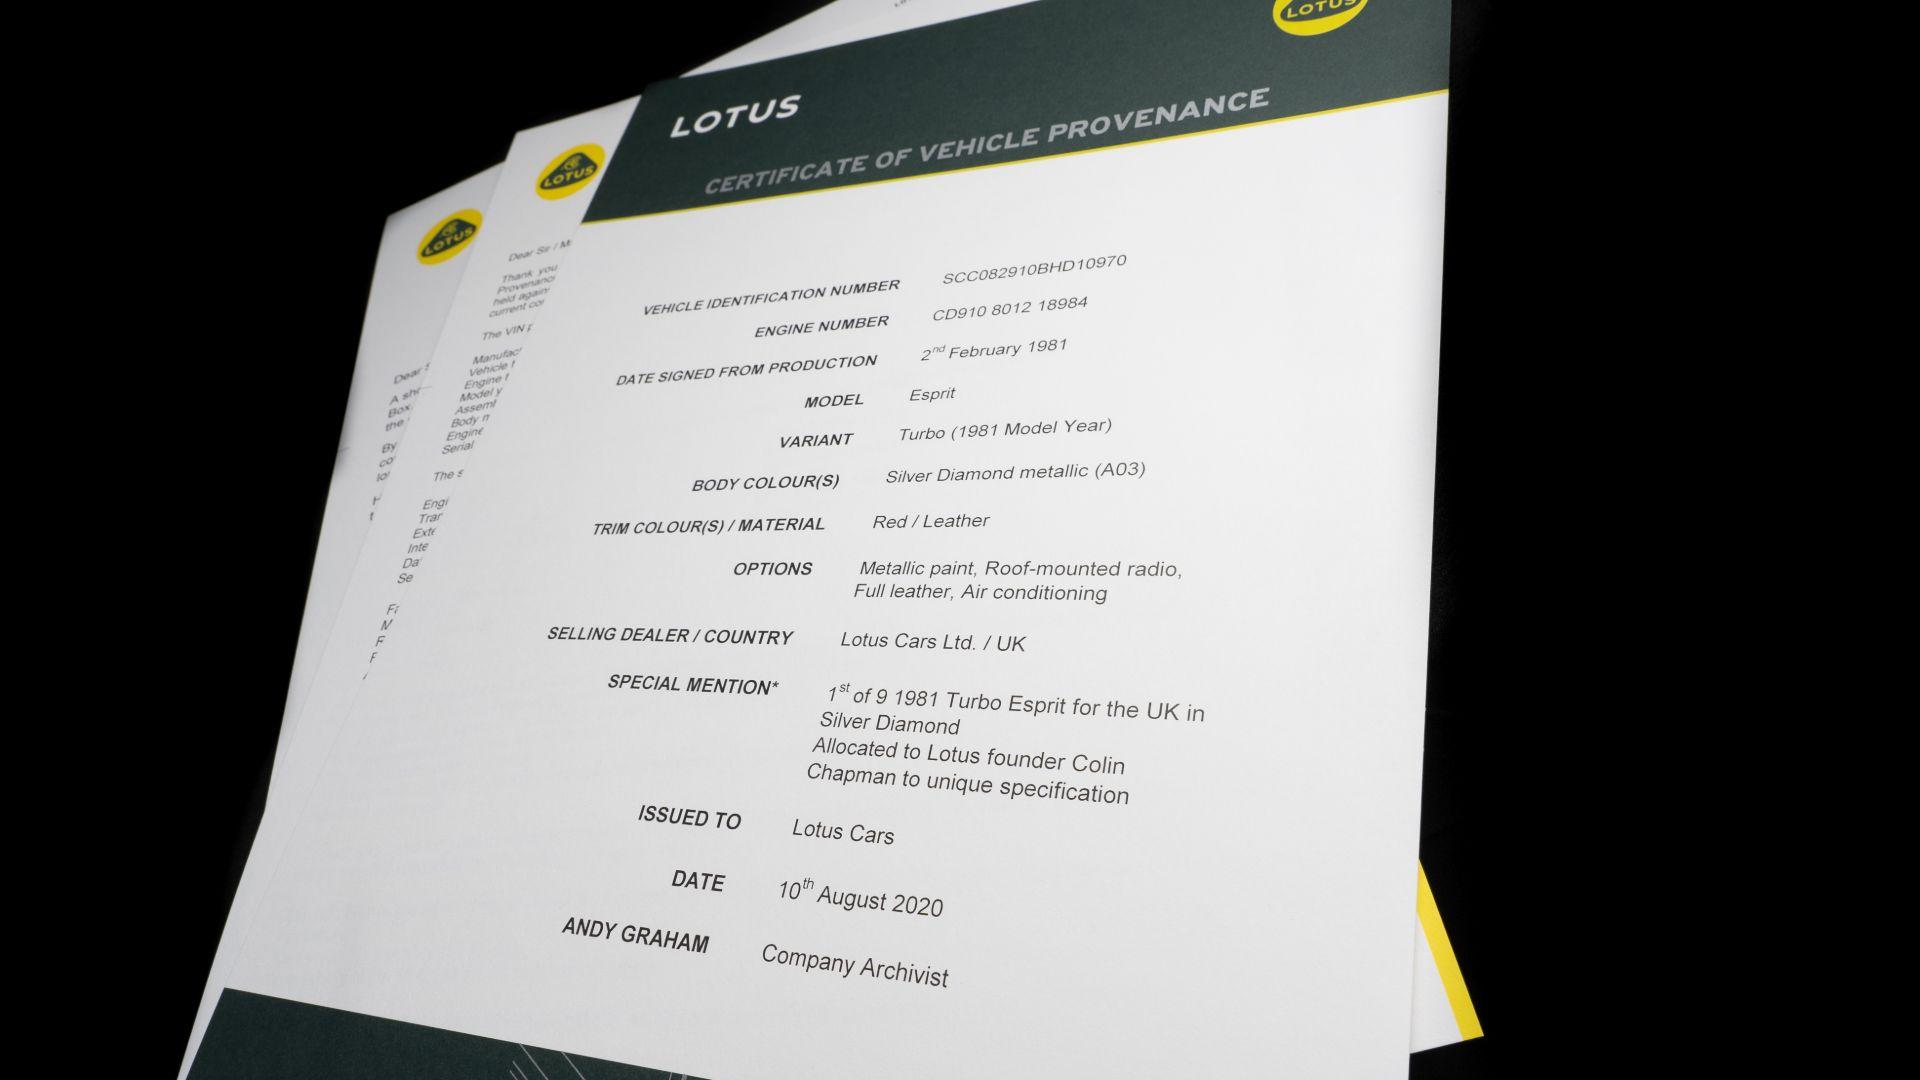 Lotus Certificate of Provenance